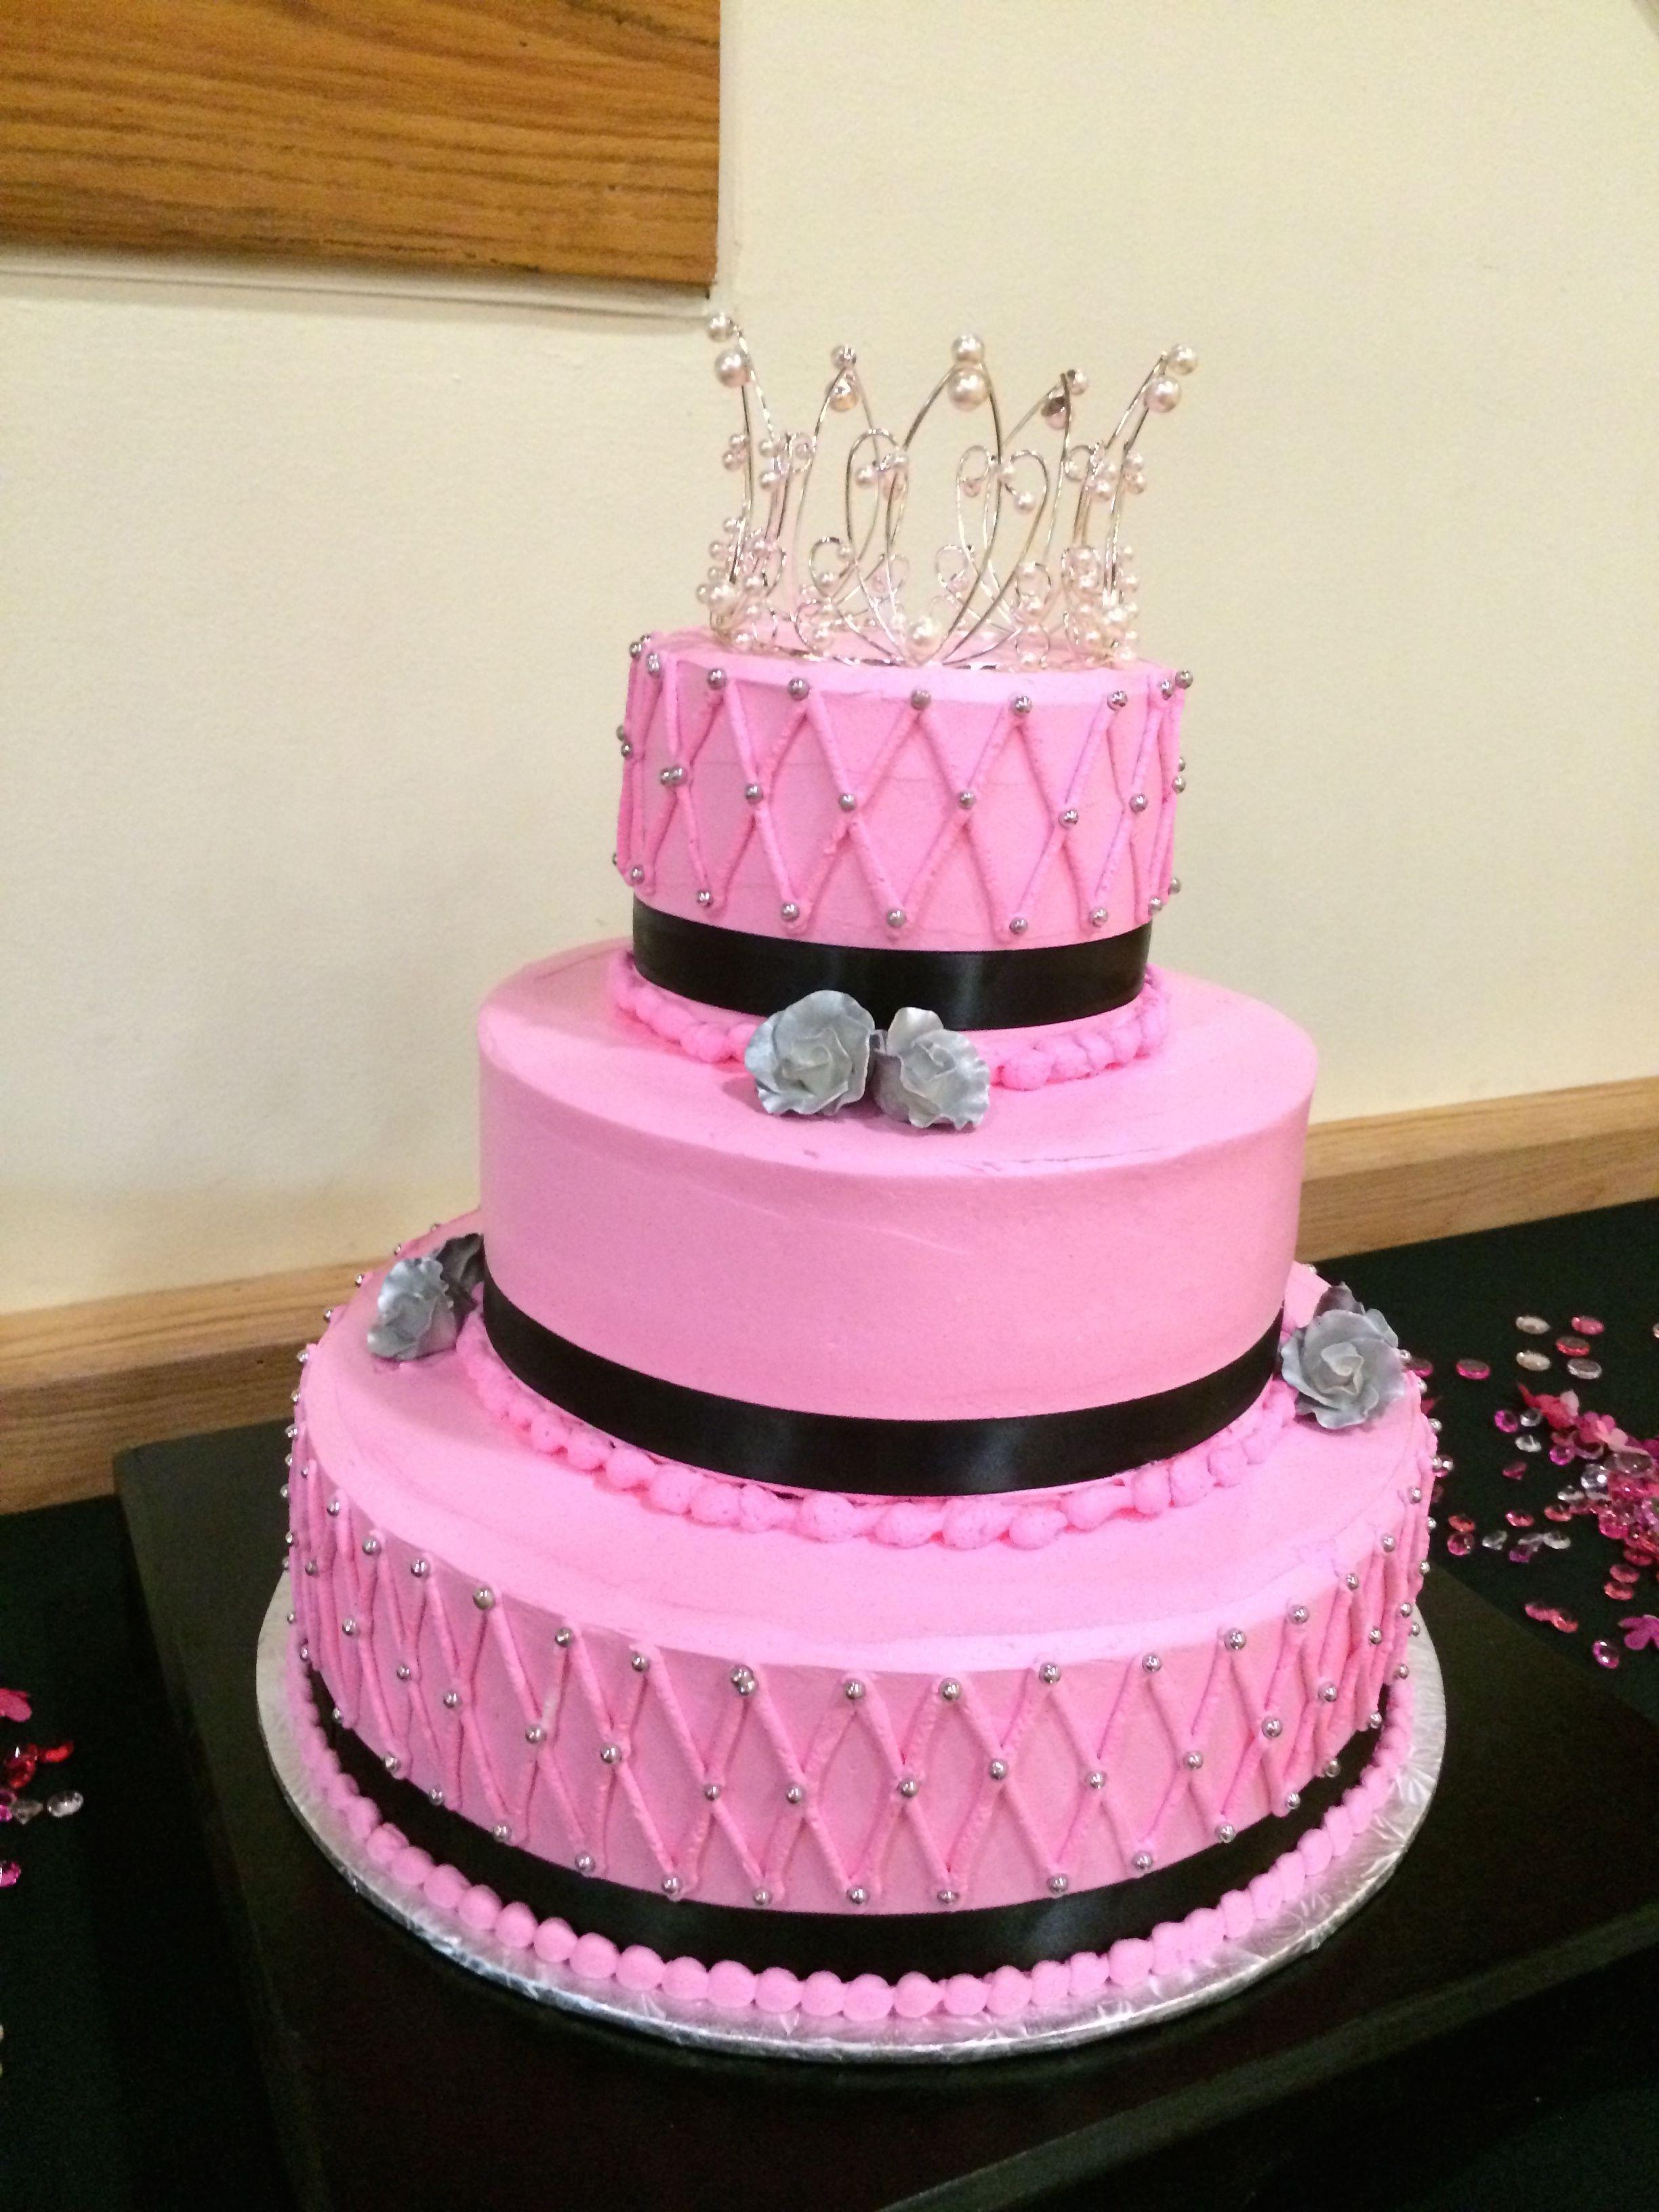 Cake with Tiara Topper.